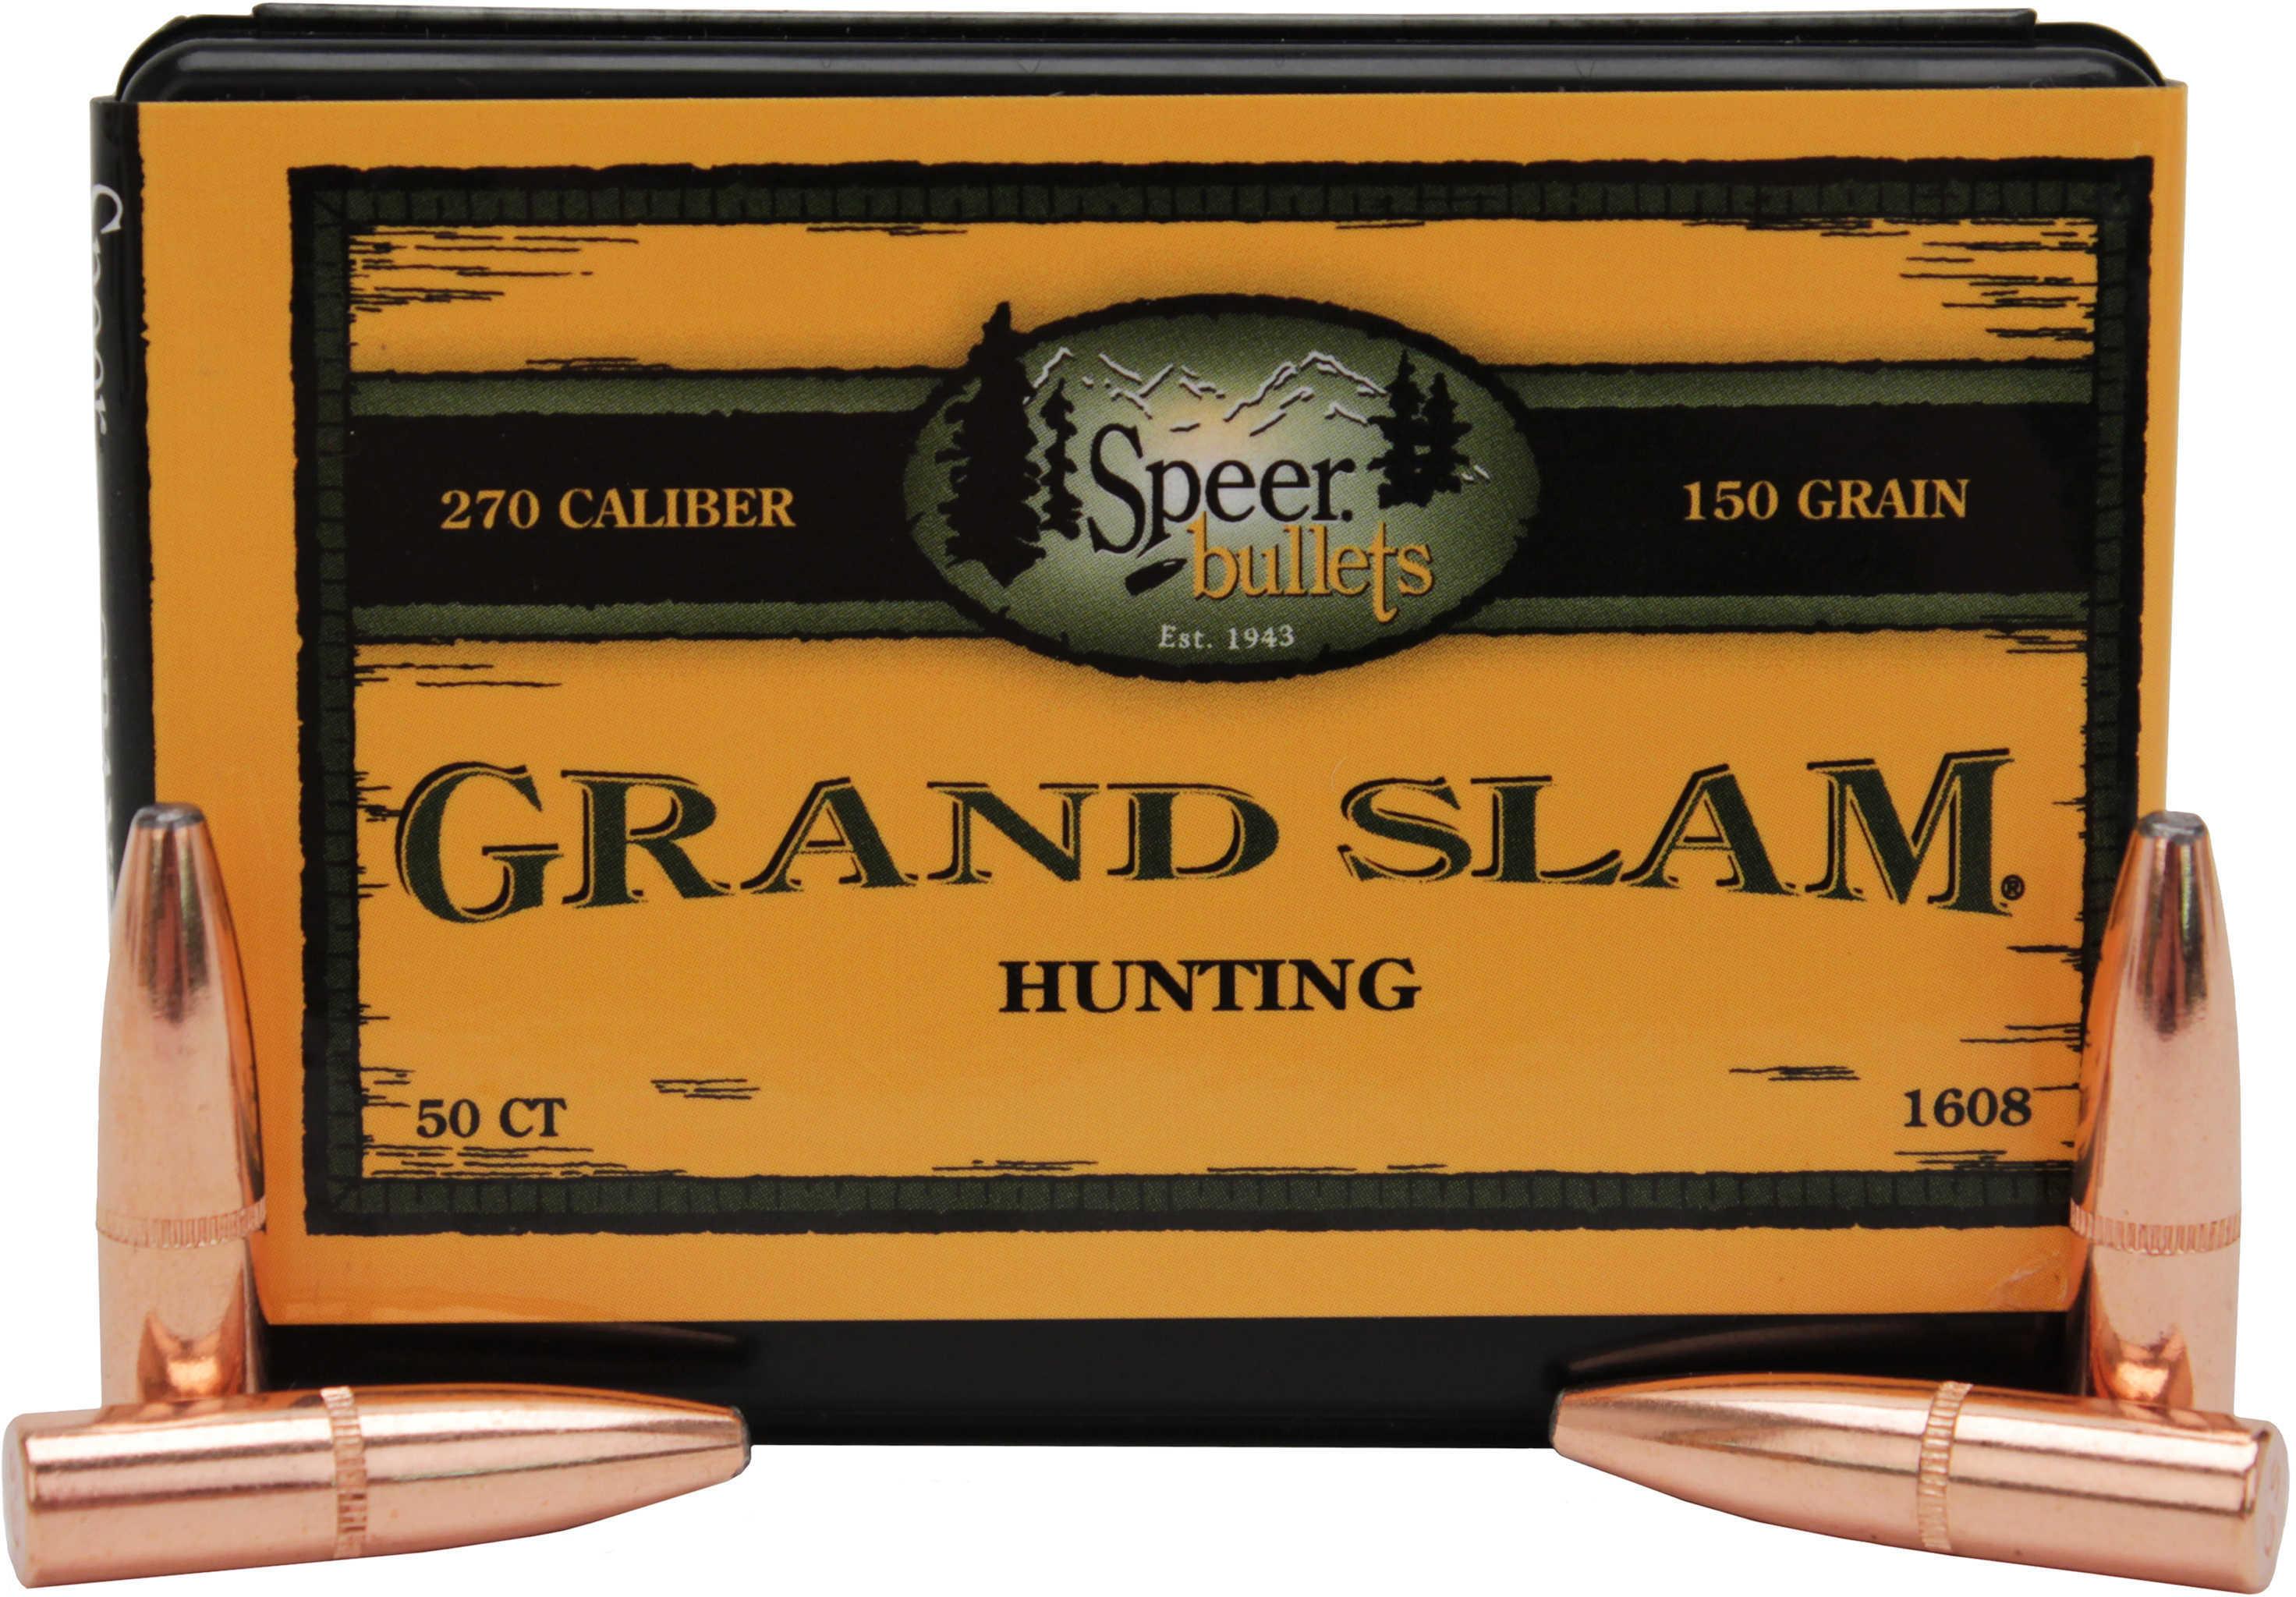 Speer 270 Caliber 150 Grains SP Grand Slam Per 50 Md: 1608 Bullets